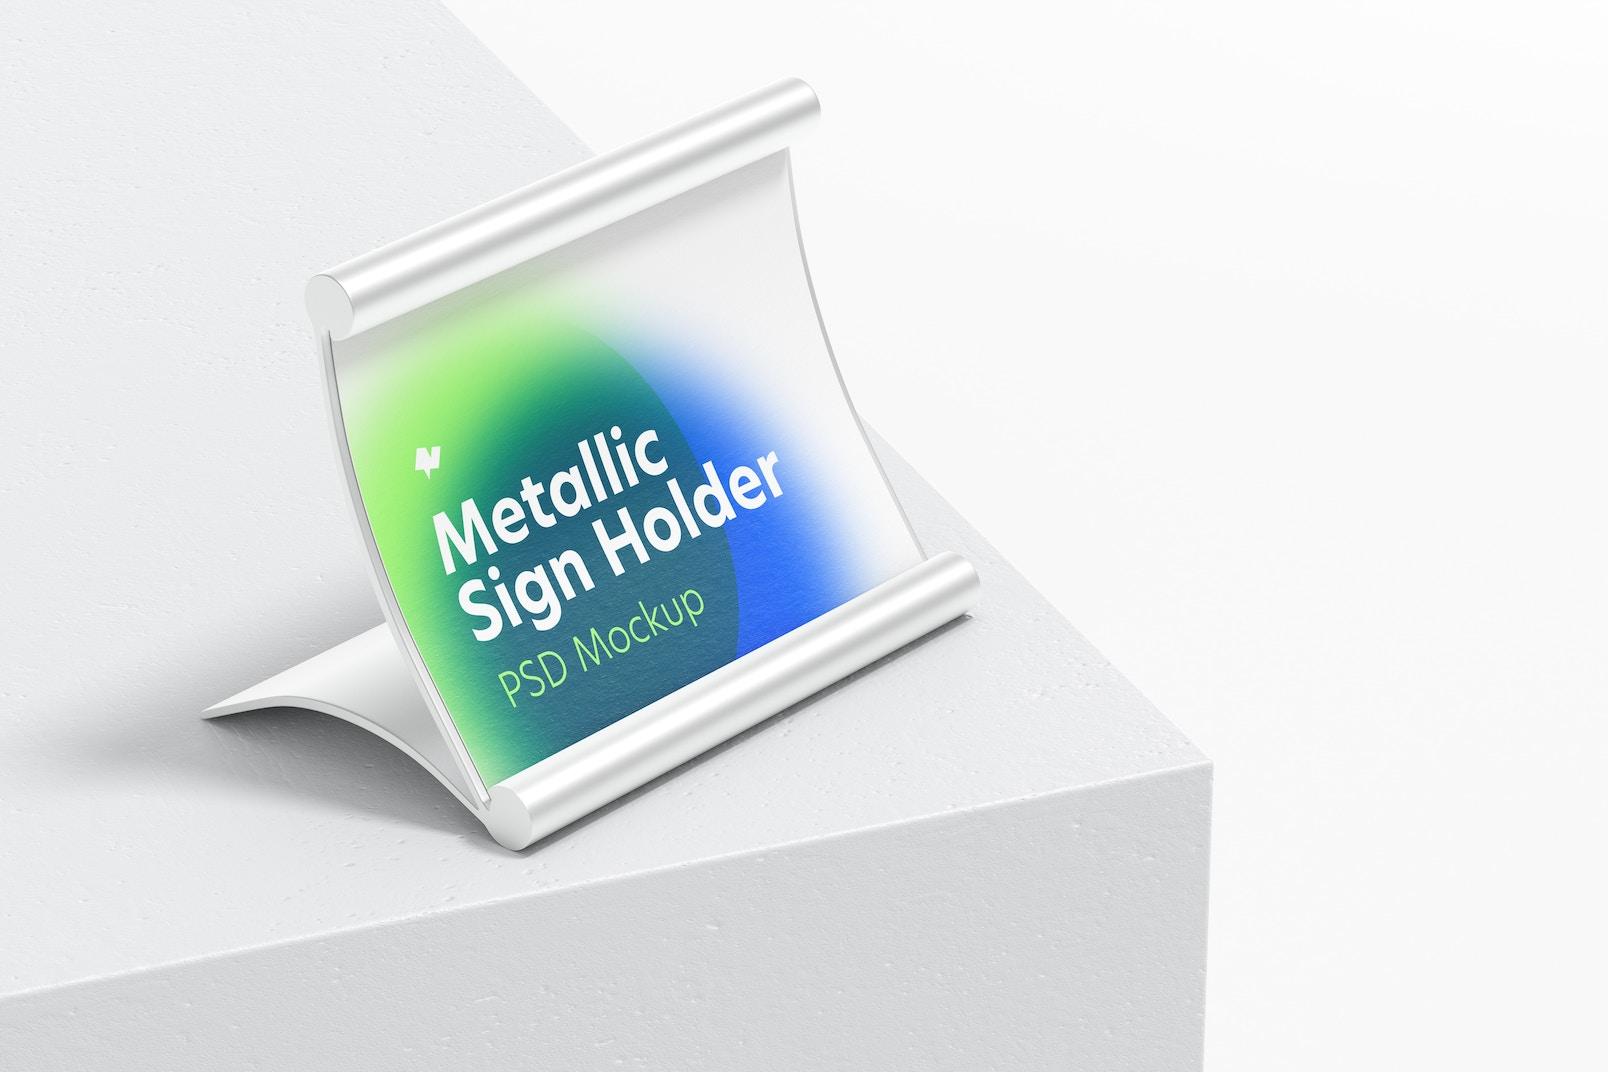 Metallic Table Sign Holder Mockup